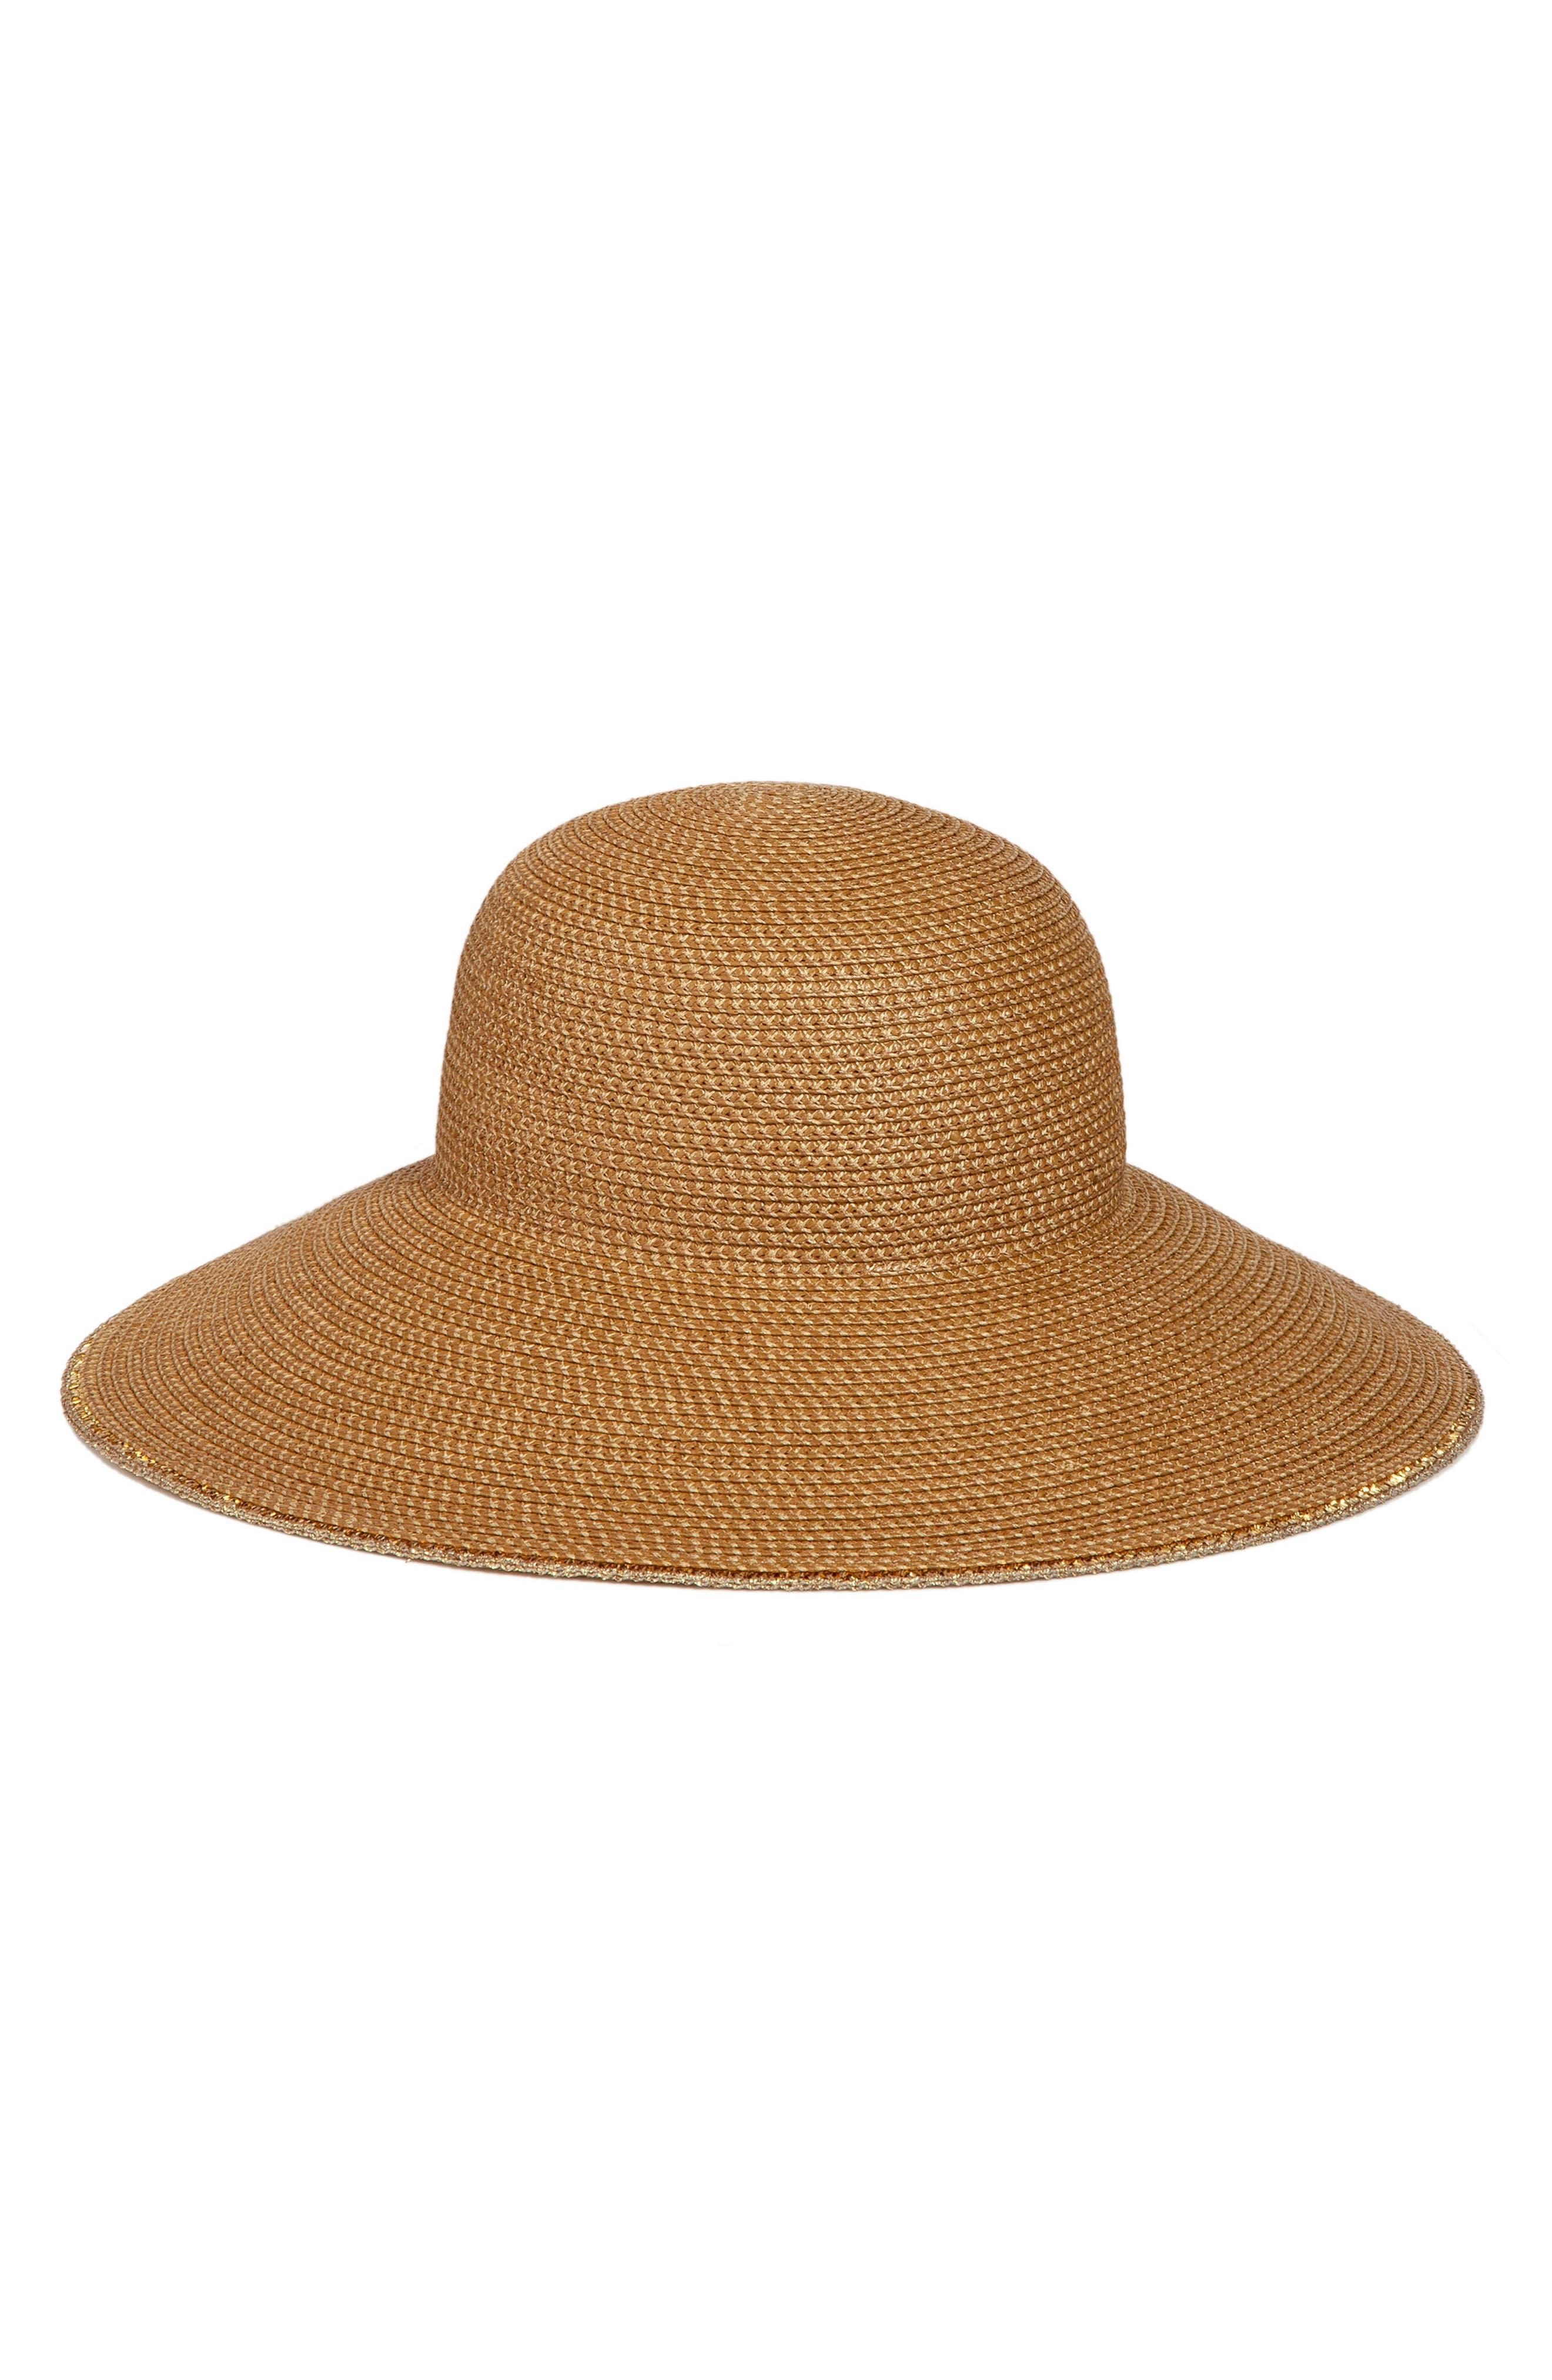 'Hampton' Straw Sun Hat, Main, color, NATURAL/ GOLD